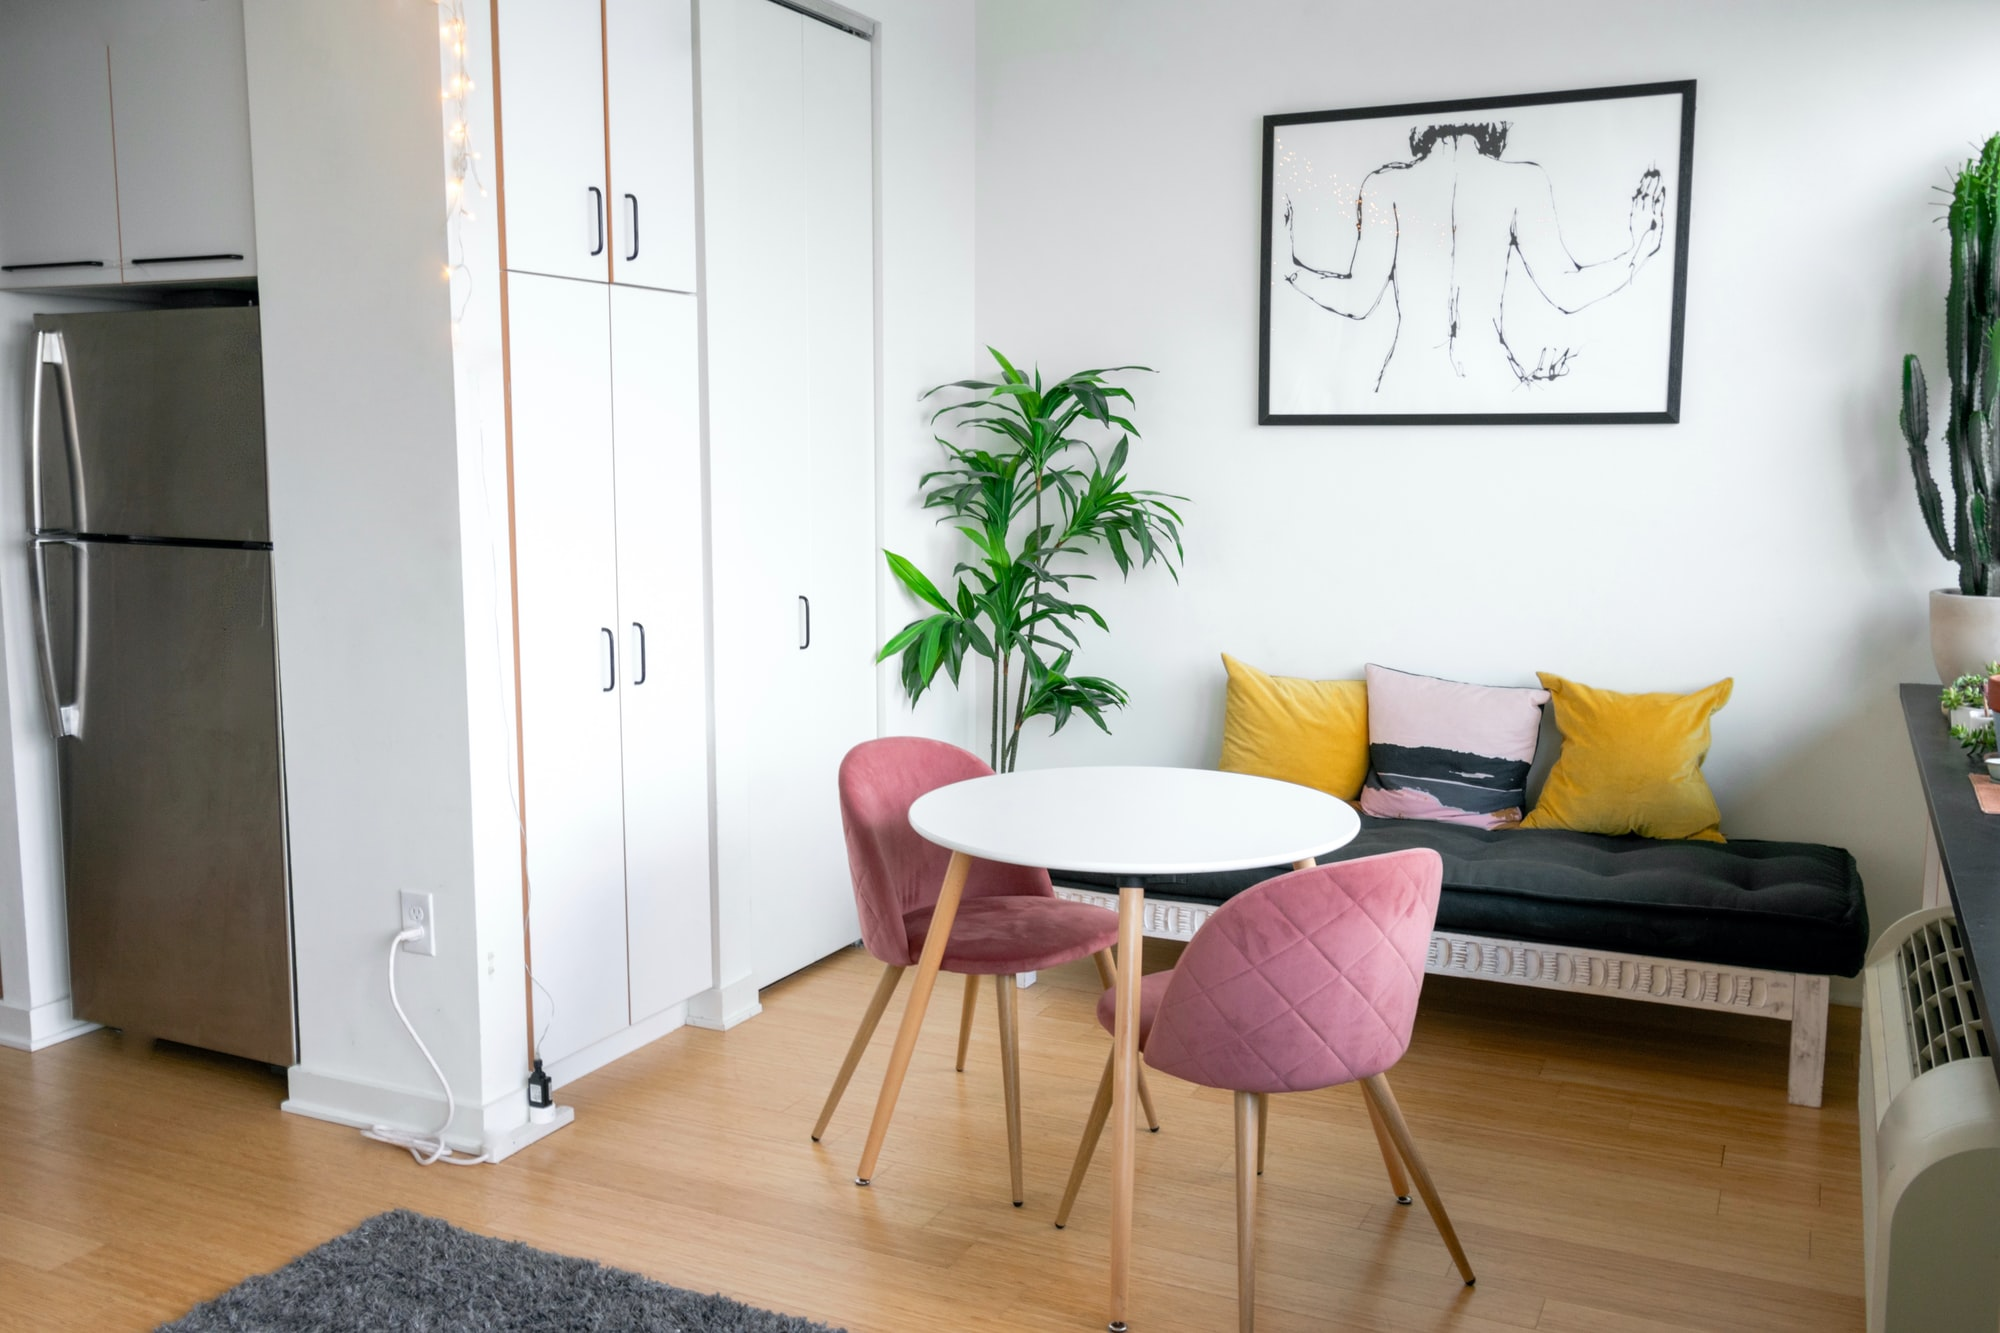 Modern apartment living room interior.